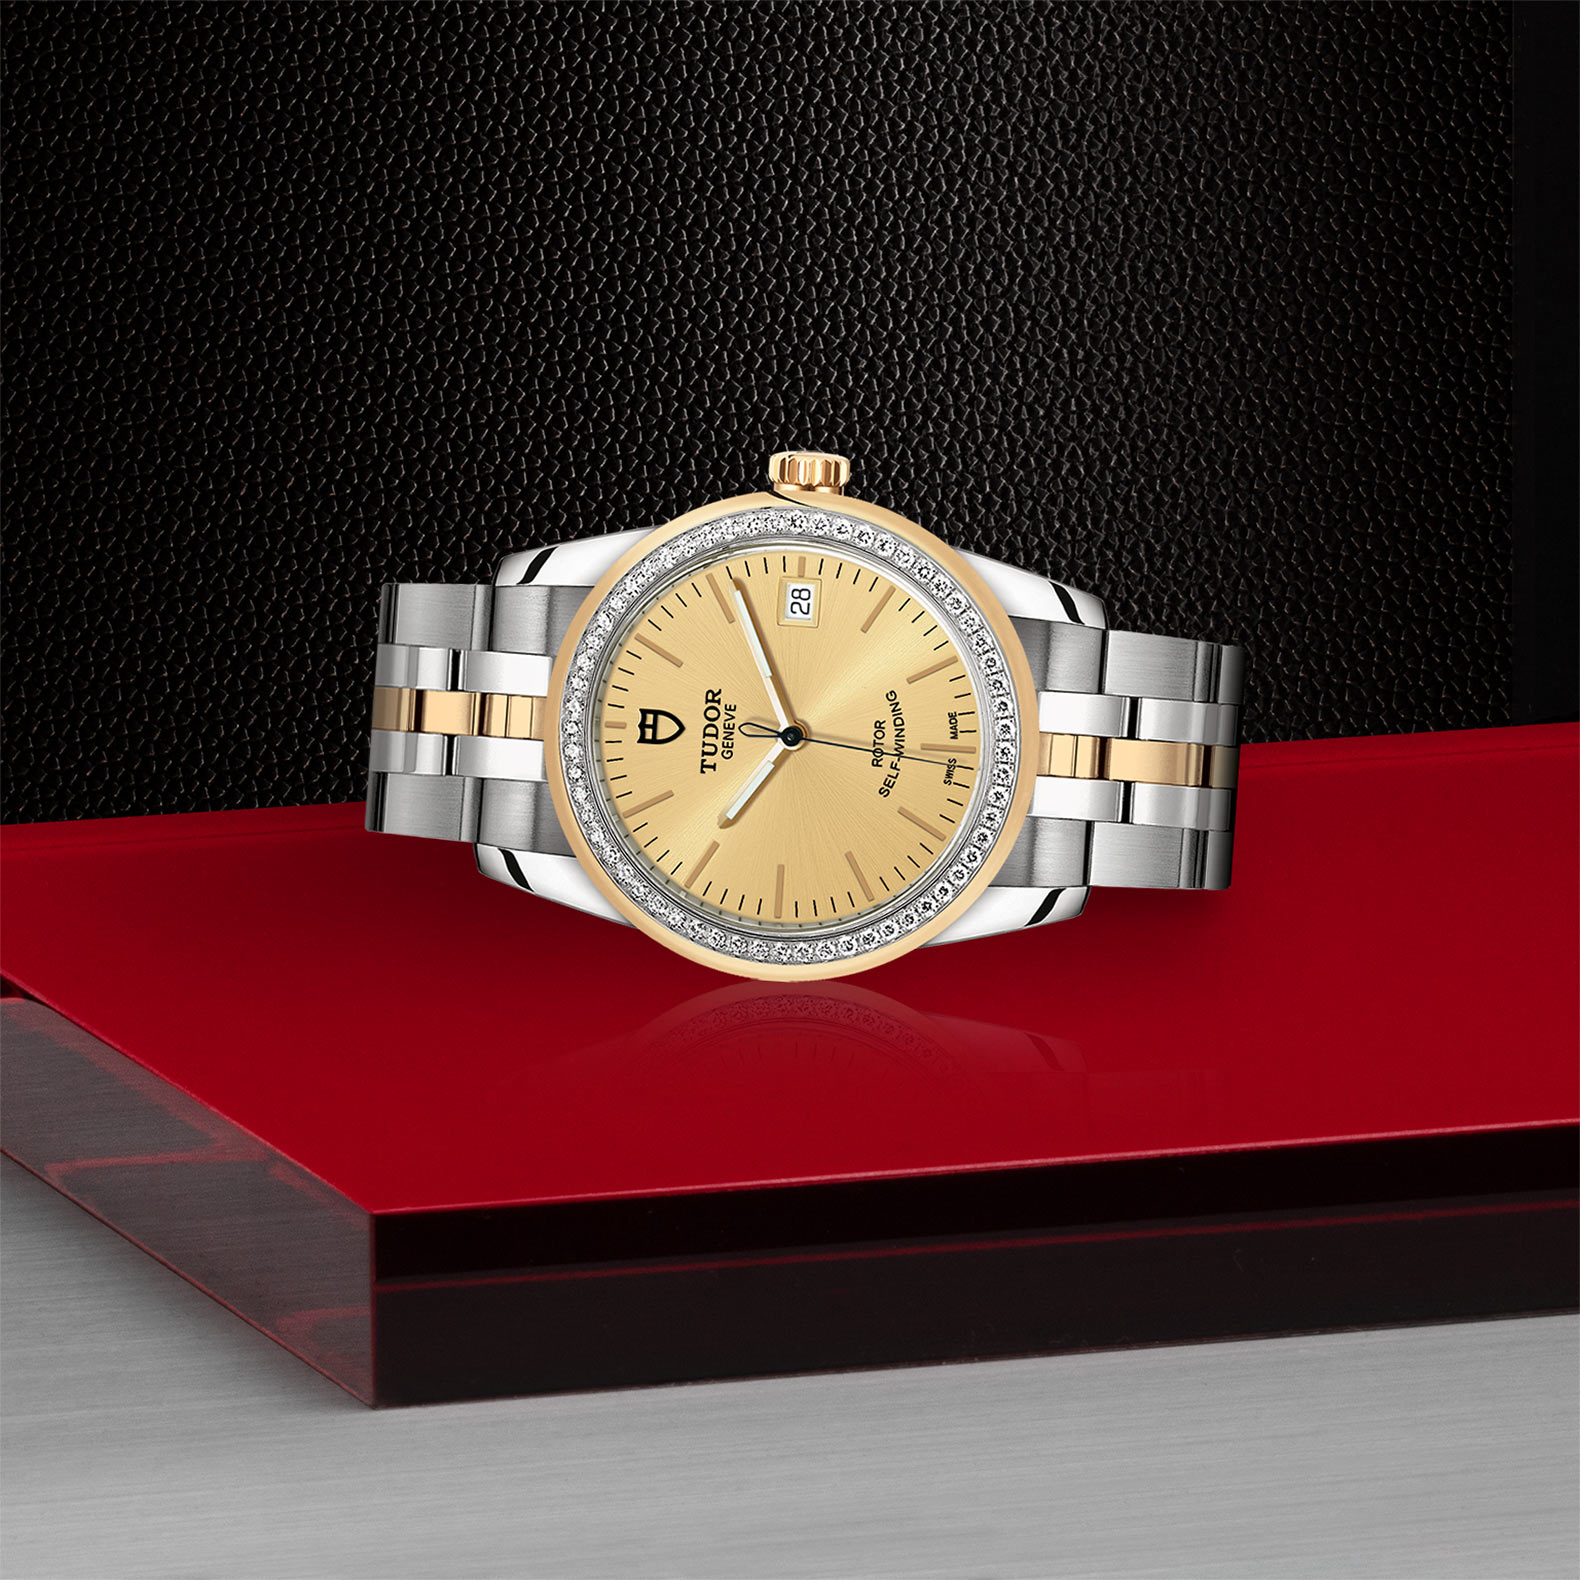 TUDOR Glamour Date - M55023-0025